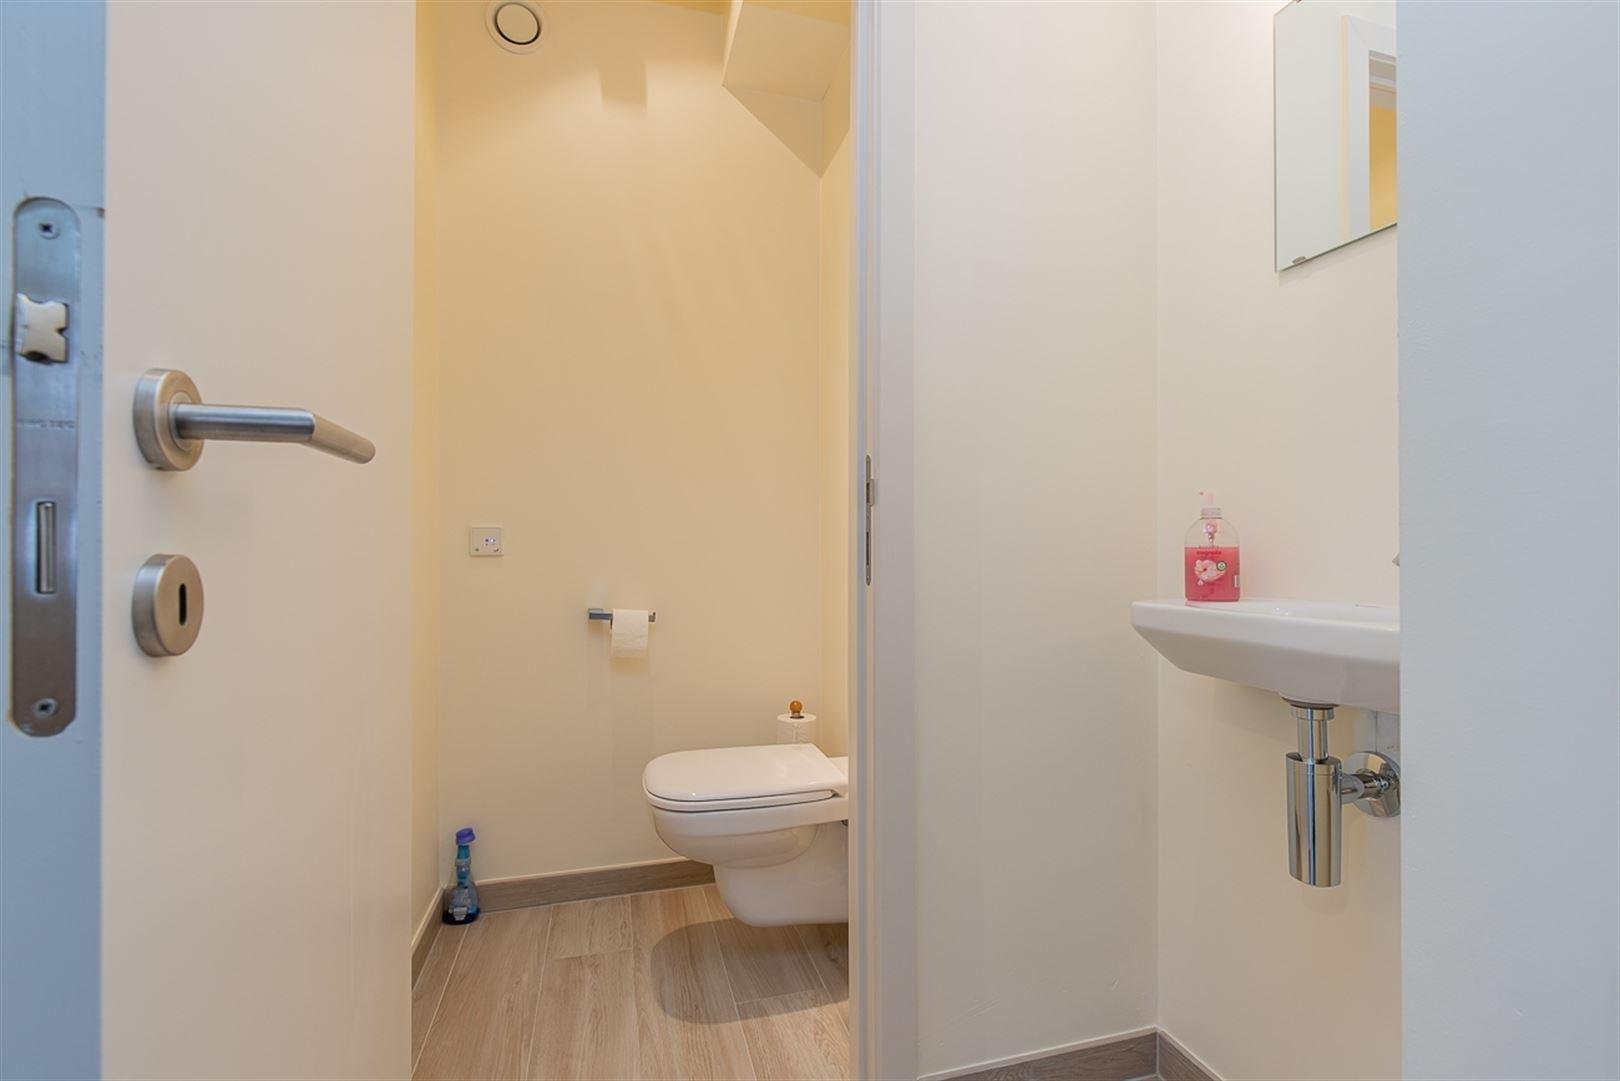 Foto 3 : Duplex/Penthouse te 9200 DENDERMONDE (België) - Prijs € 399.000